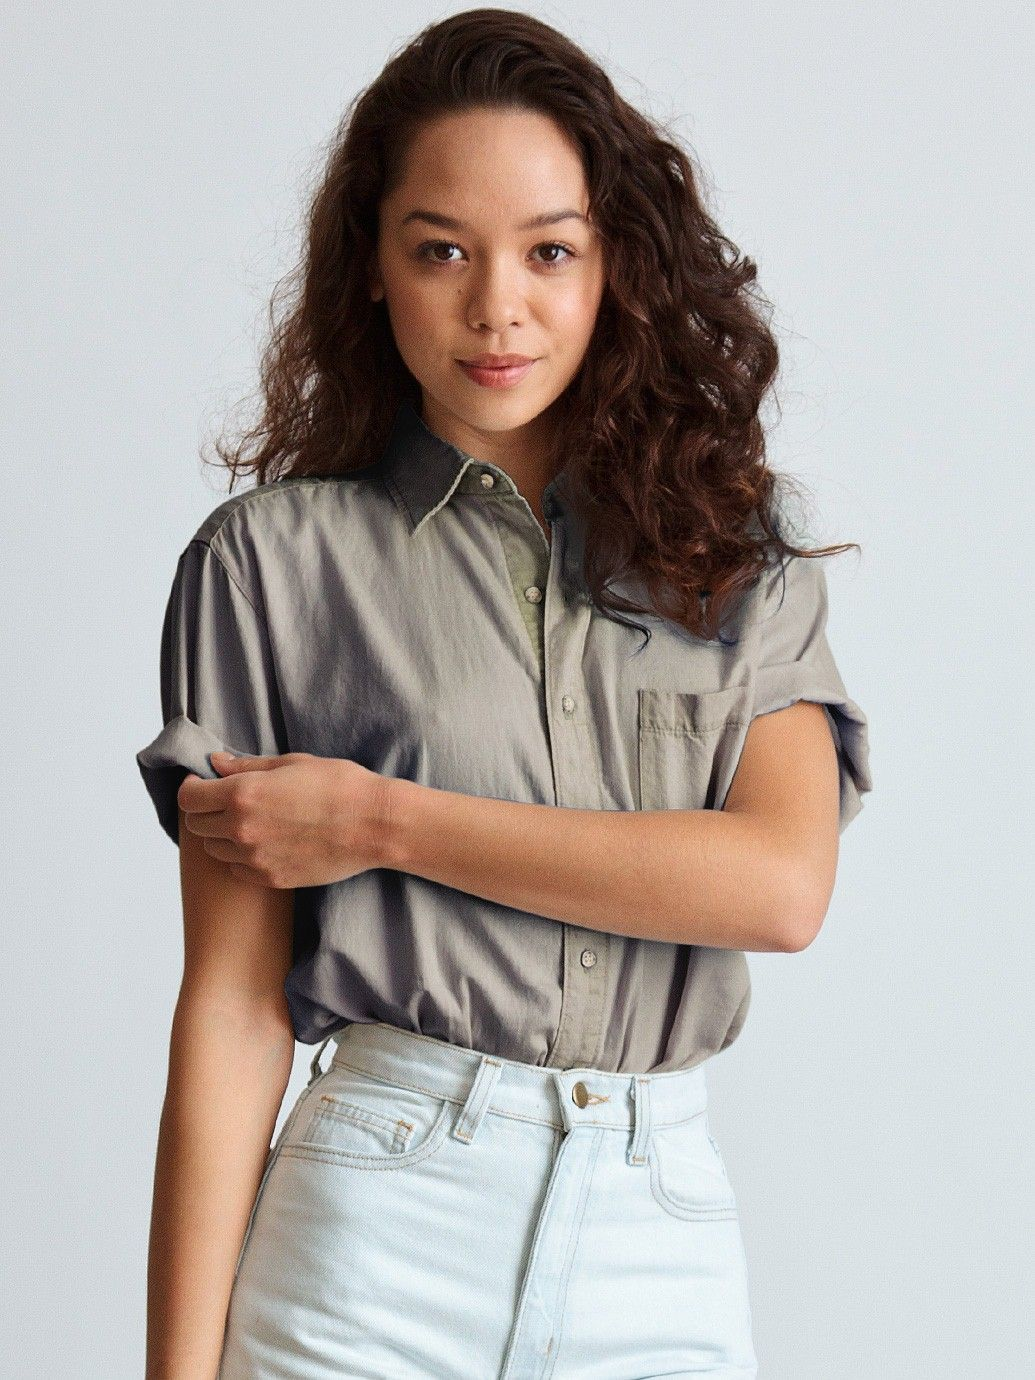 Unisex Denim Short Sleeve Button-Up | Short Sleeves | Women's ...